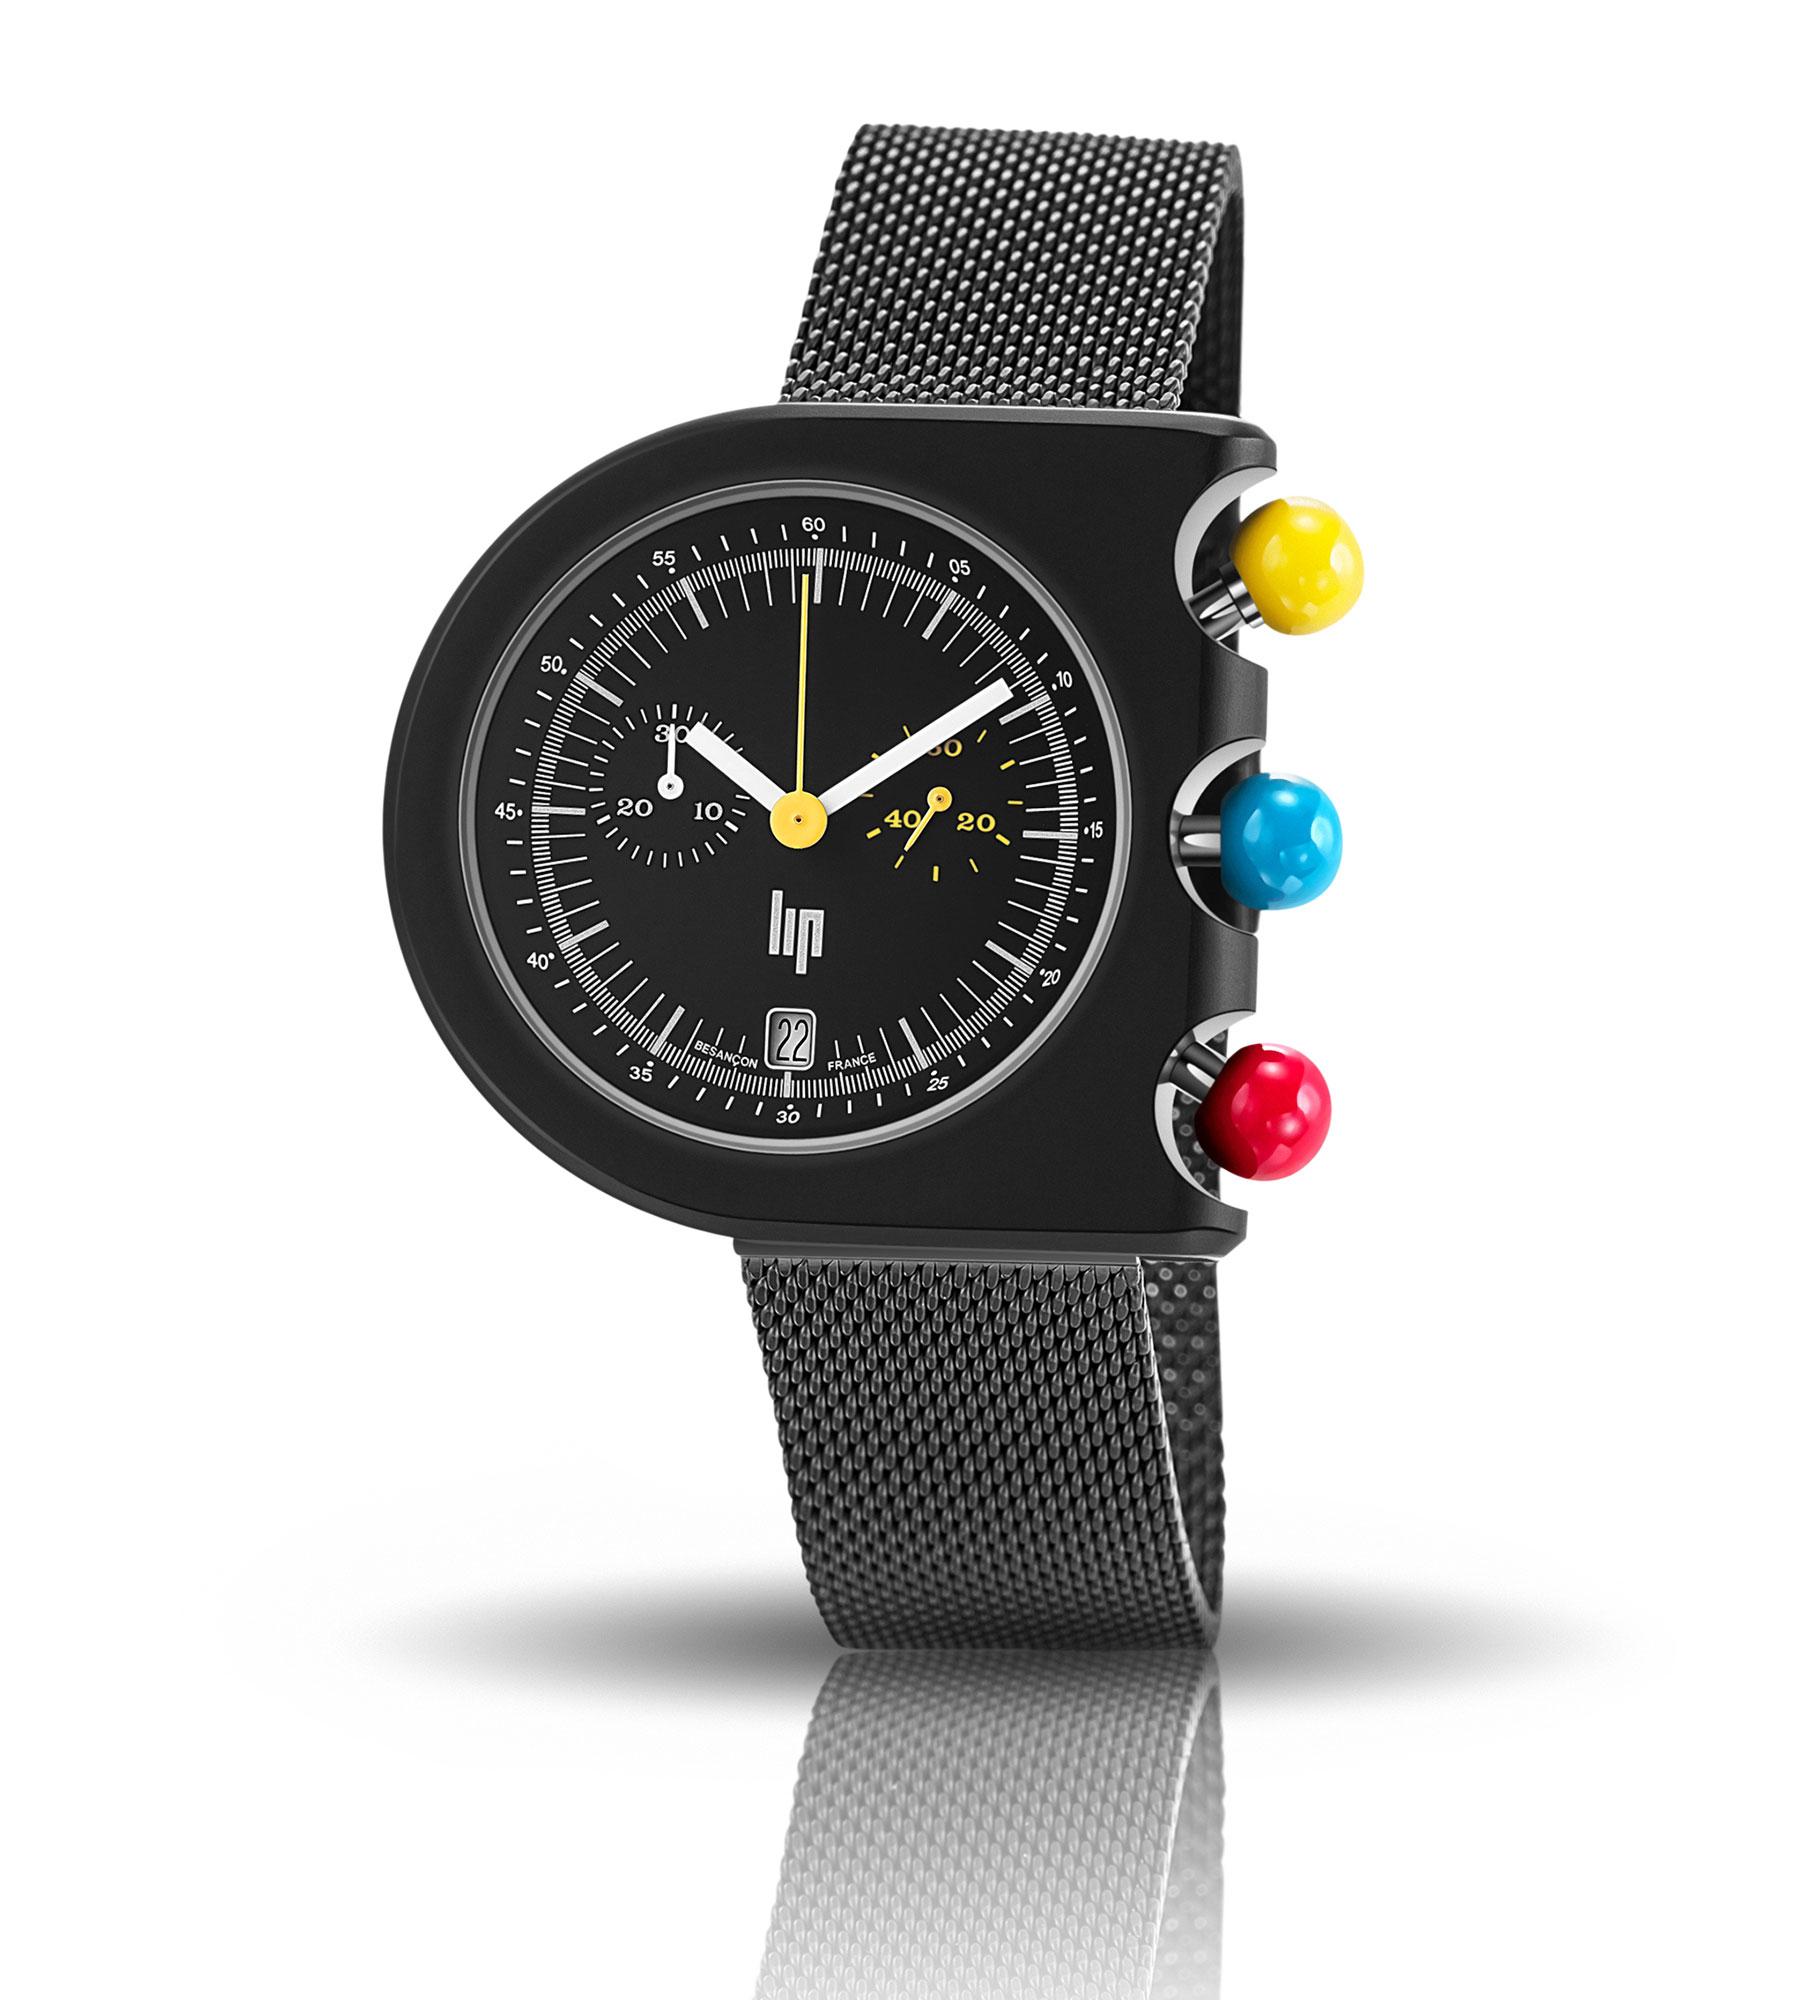 Horlogerie –LIP Chrono Roger Talon montre